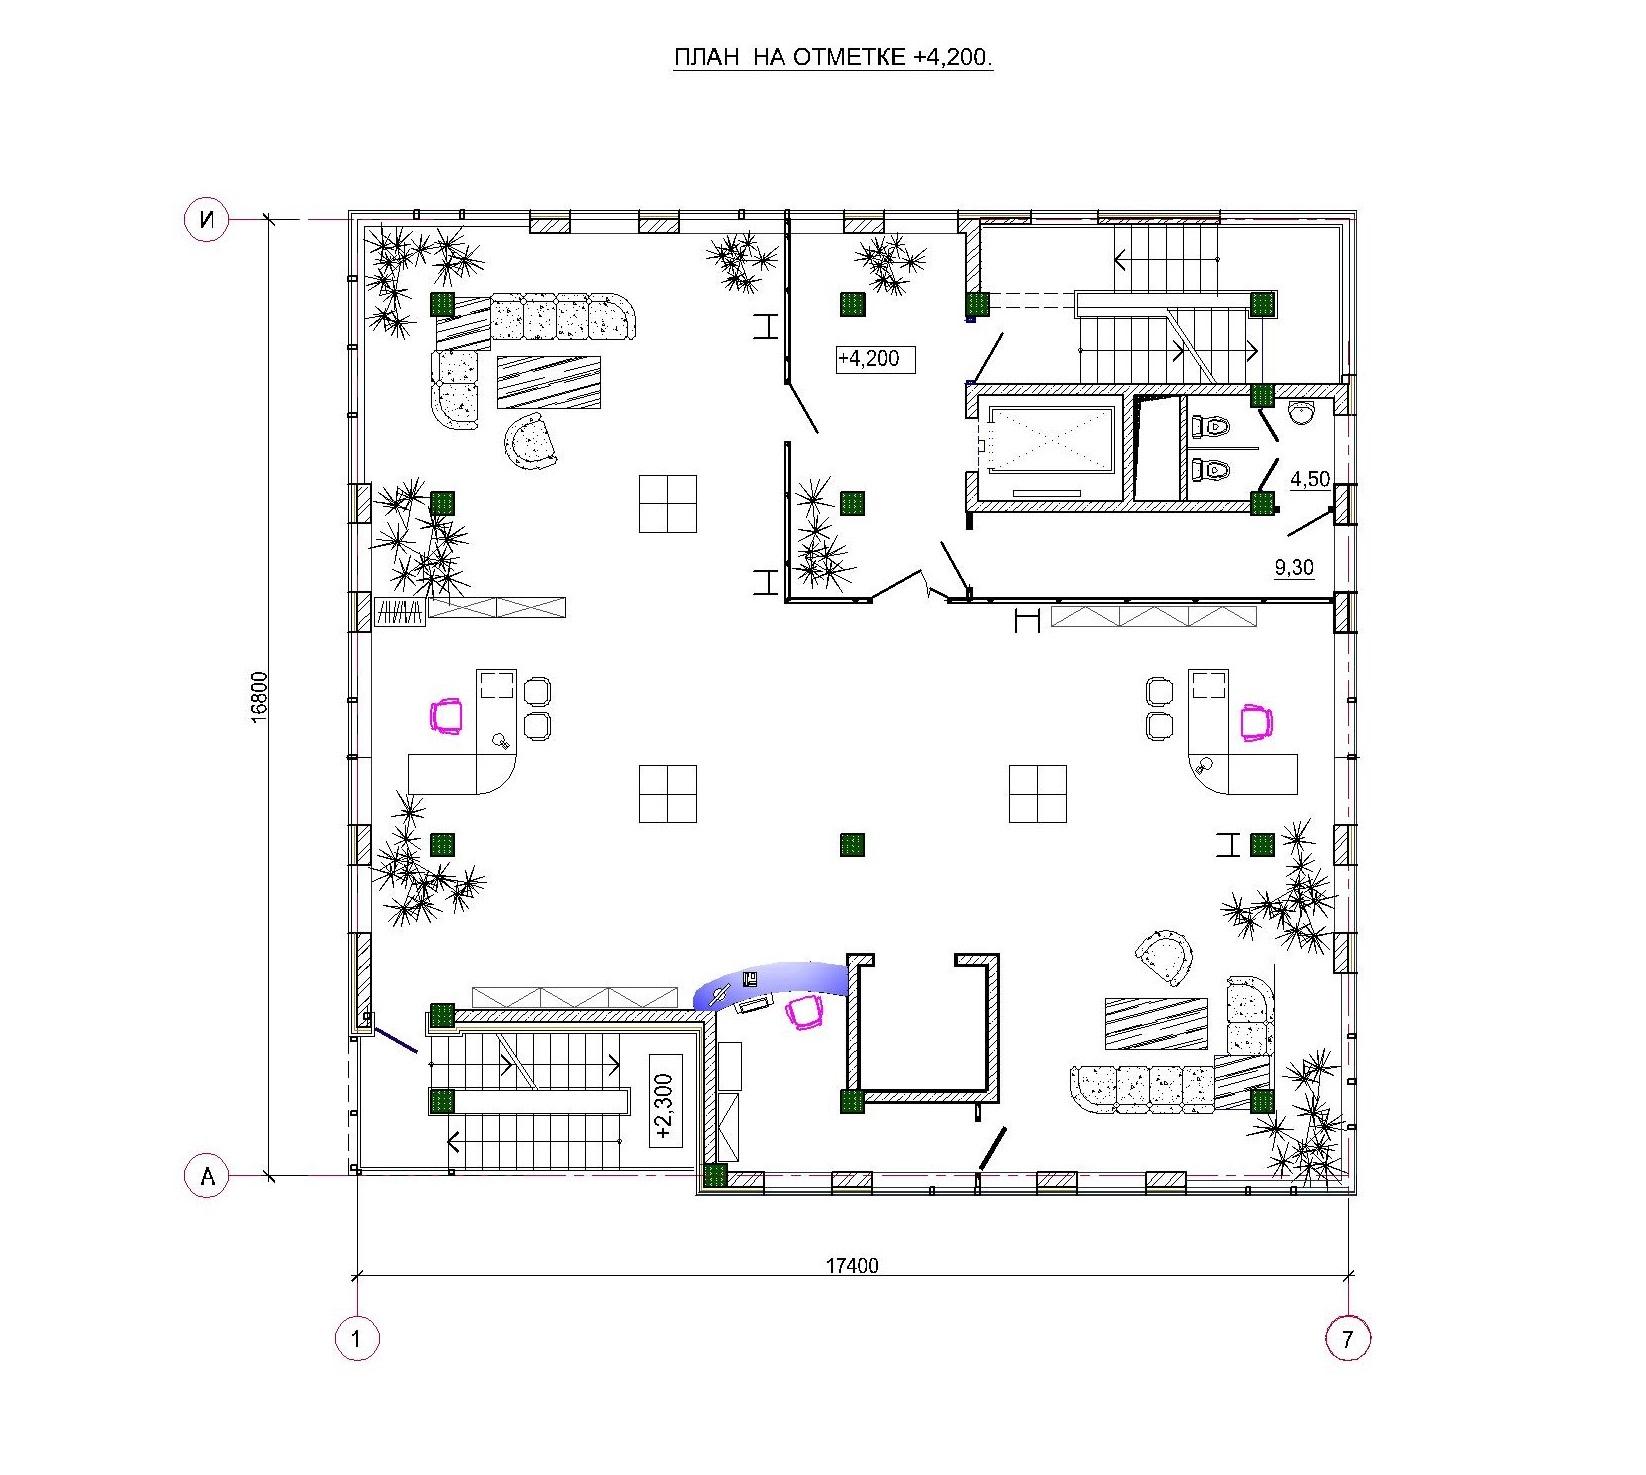 Проект административного здания. План на отм. +4.200